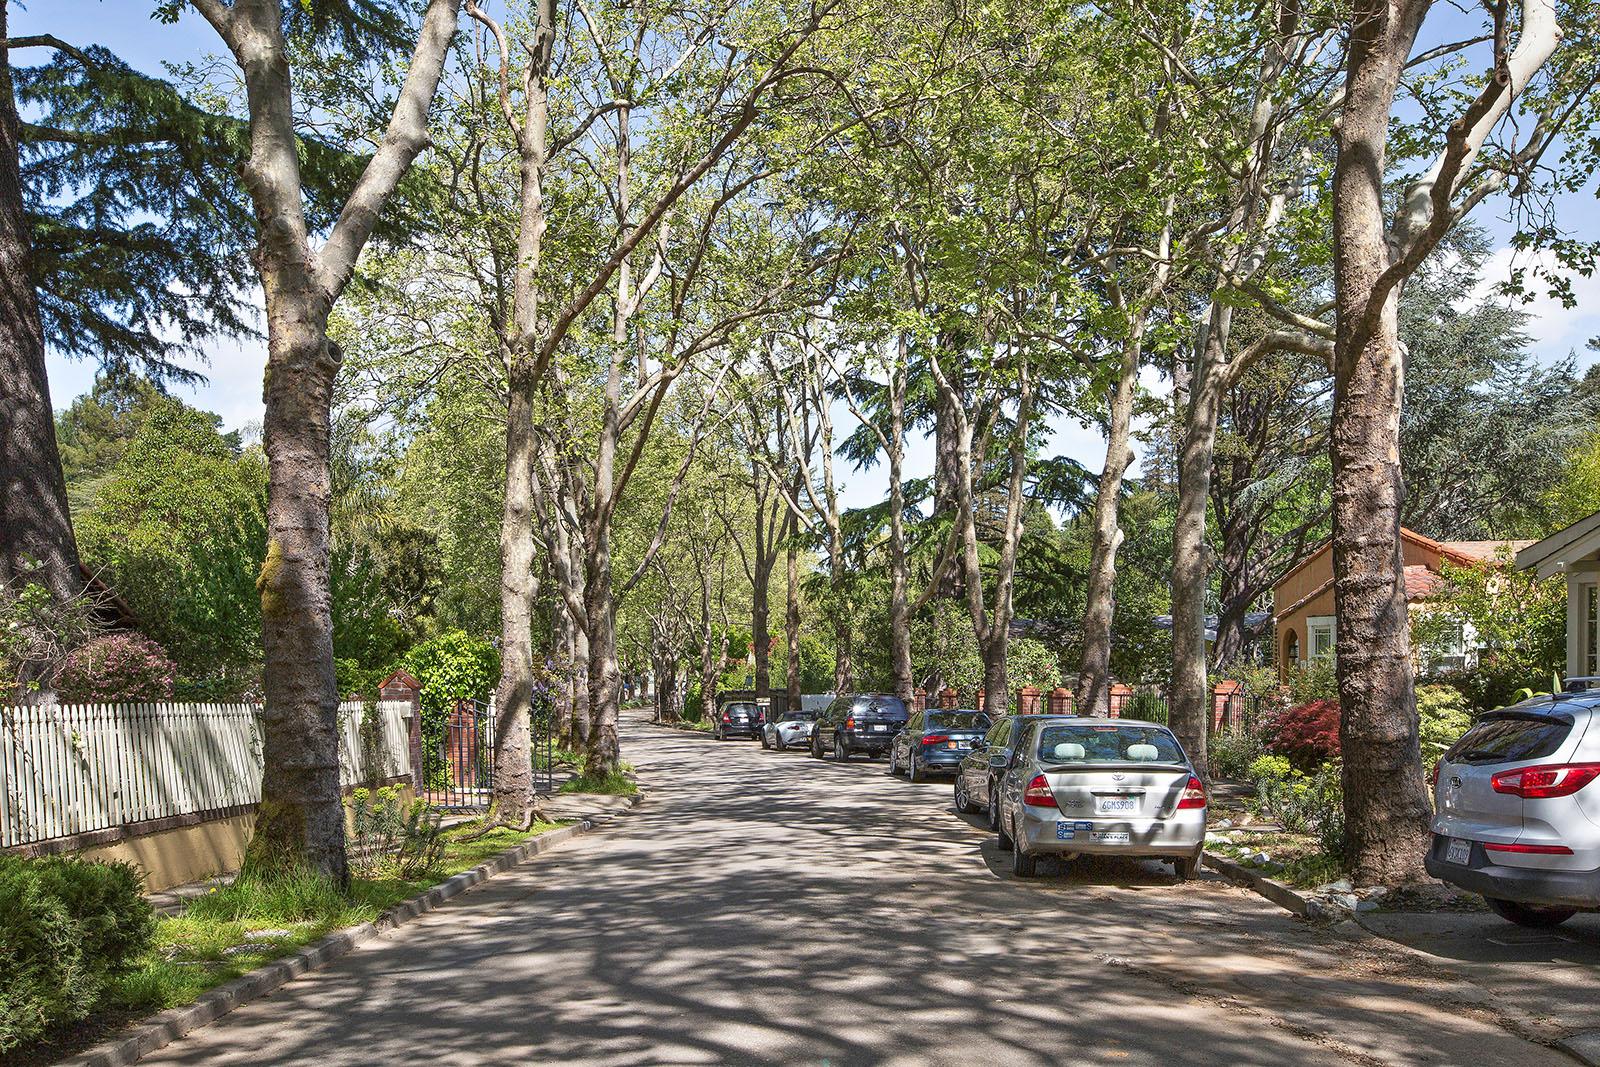 77 Cypress Tree Lines Street